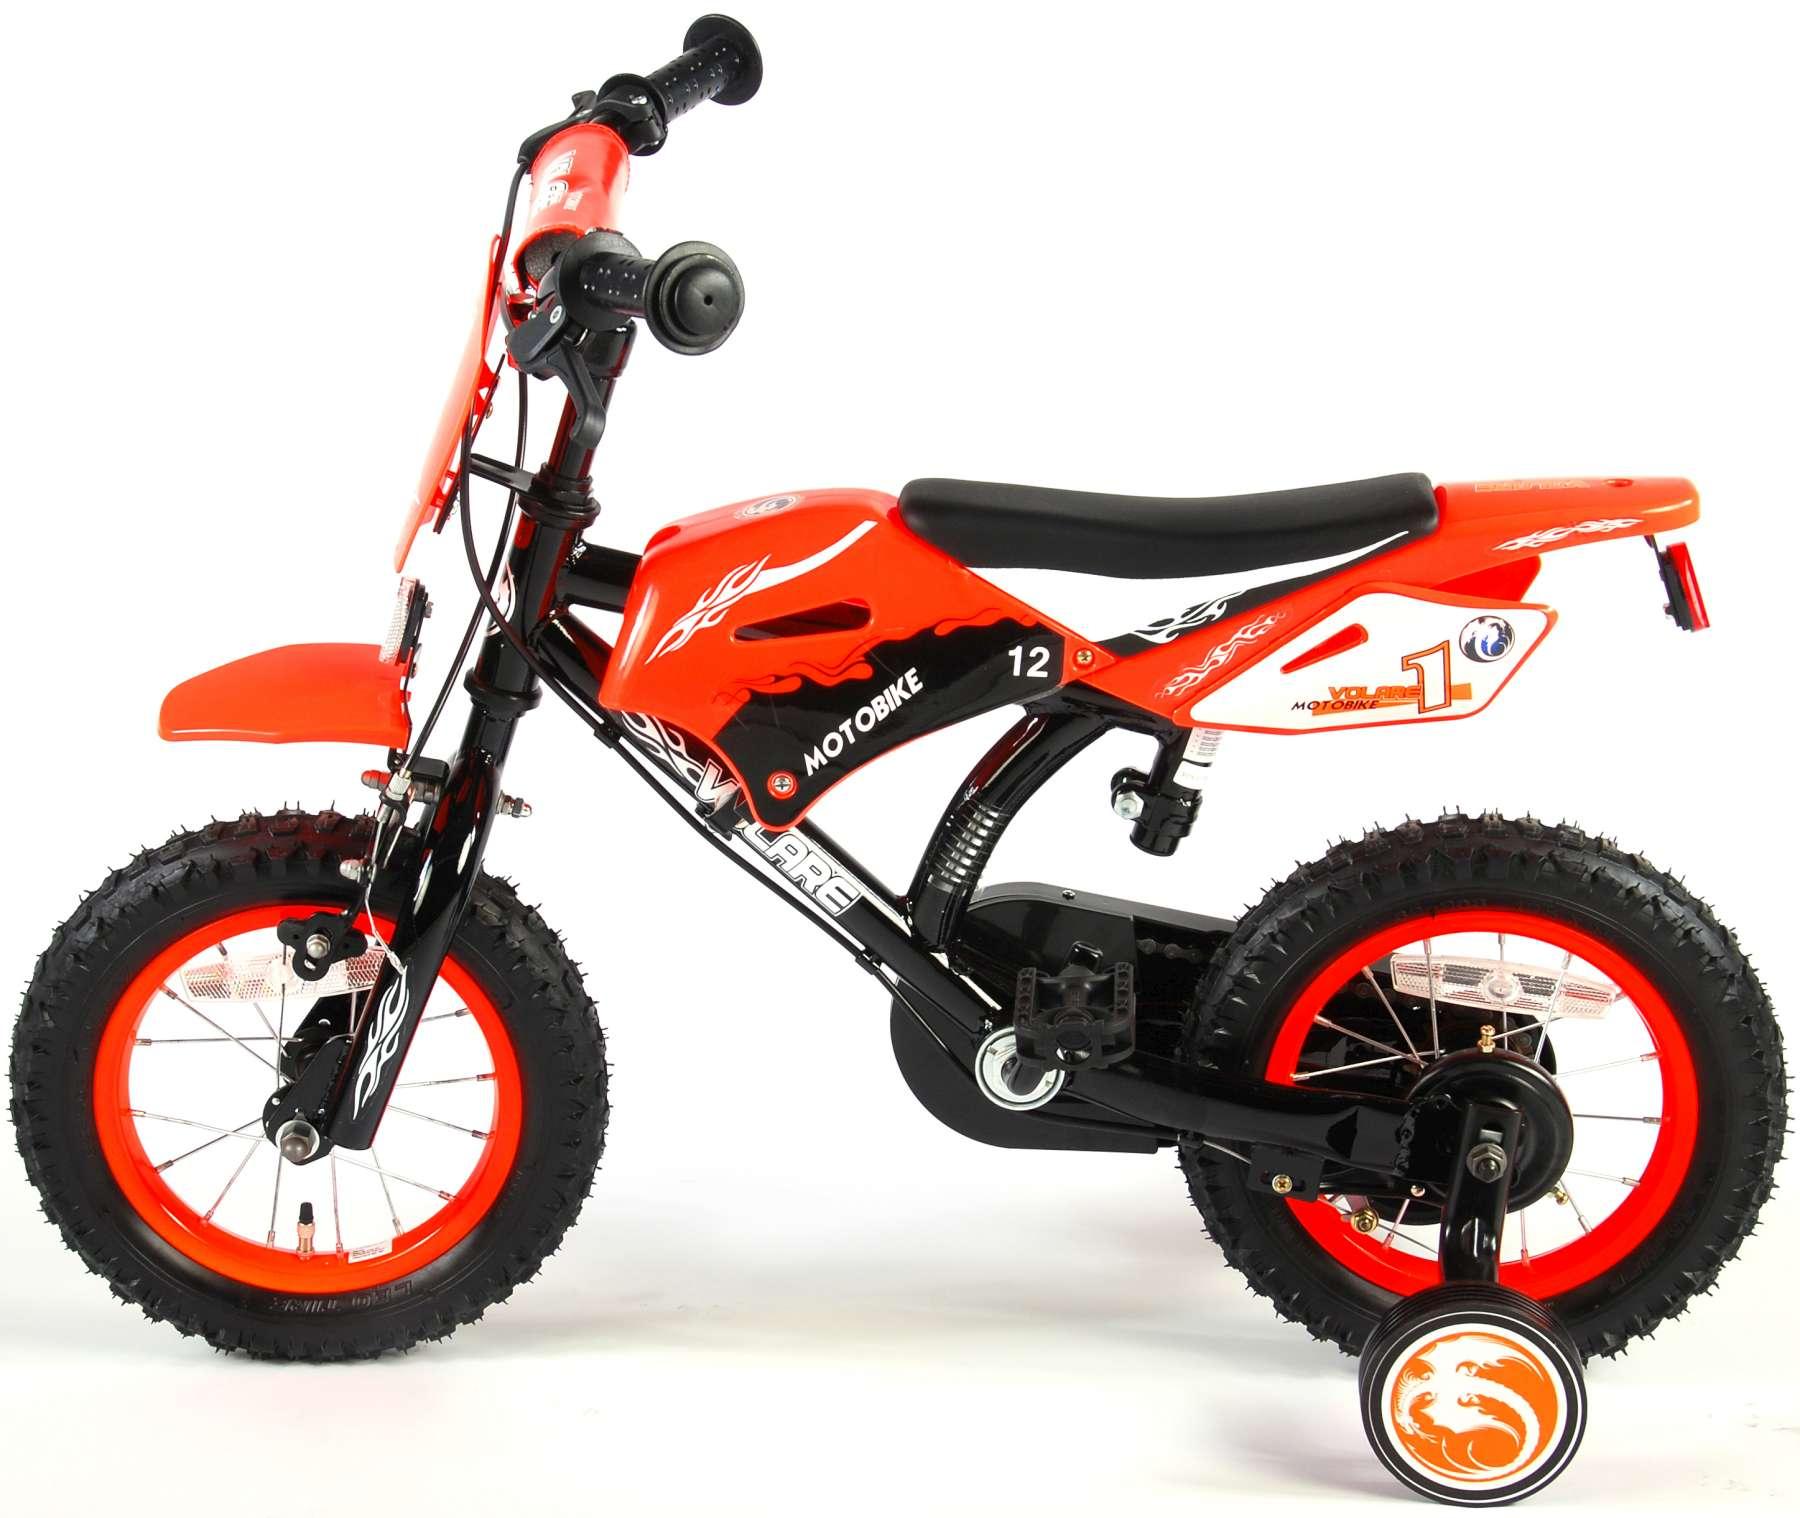 Bicicleta Motorbike de 12 pulgadas Naranja - vista lateral der.